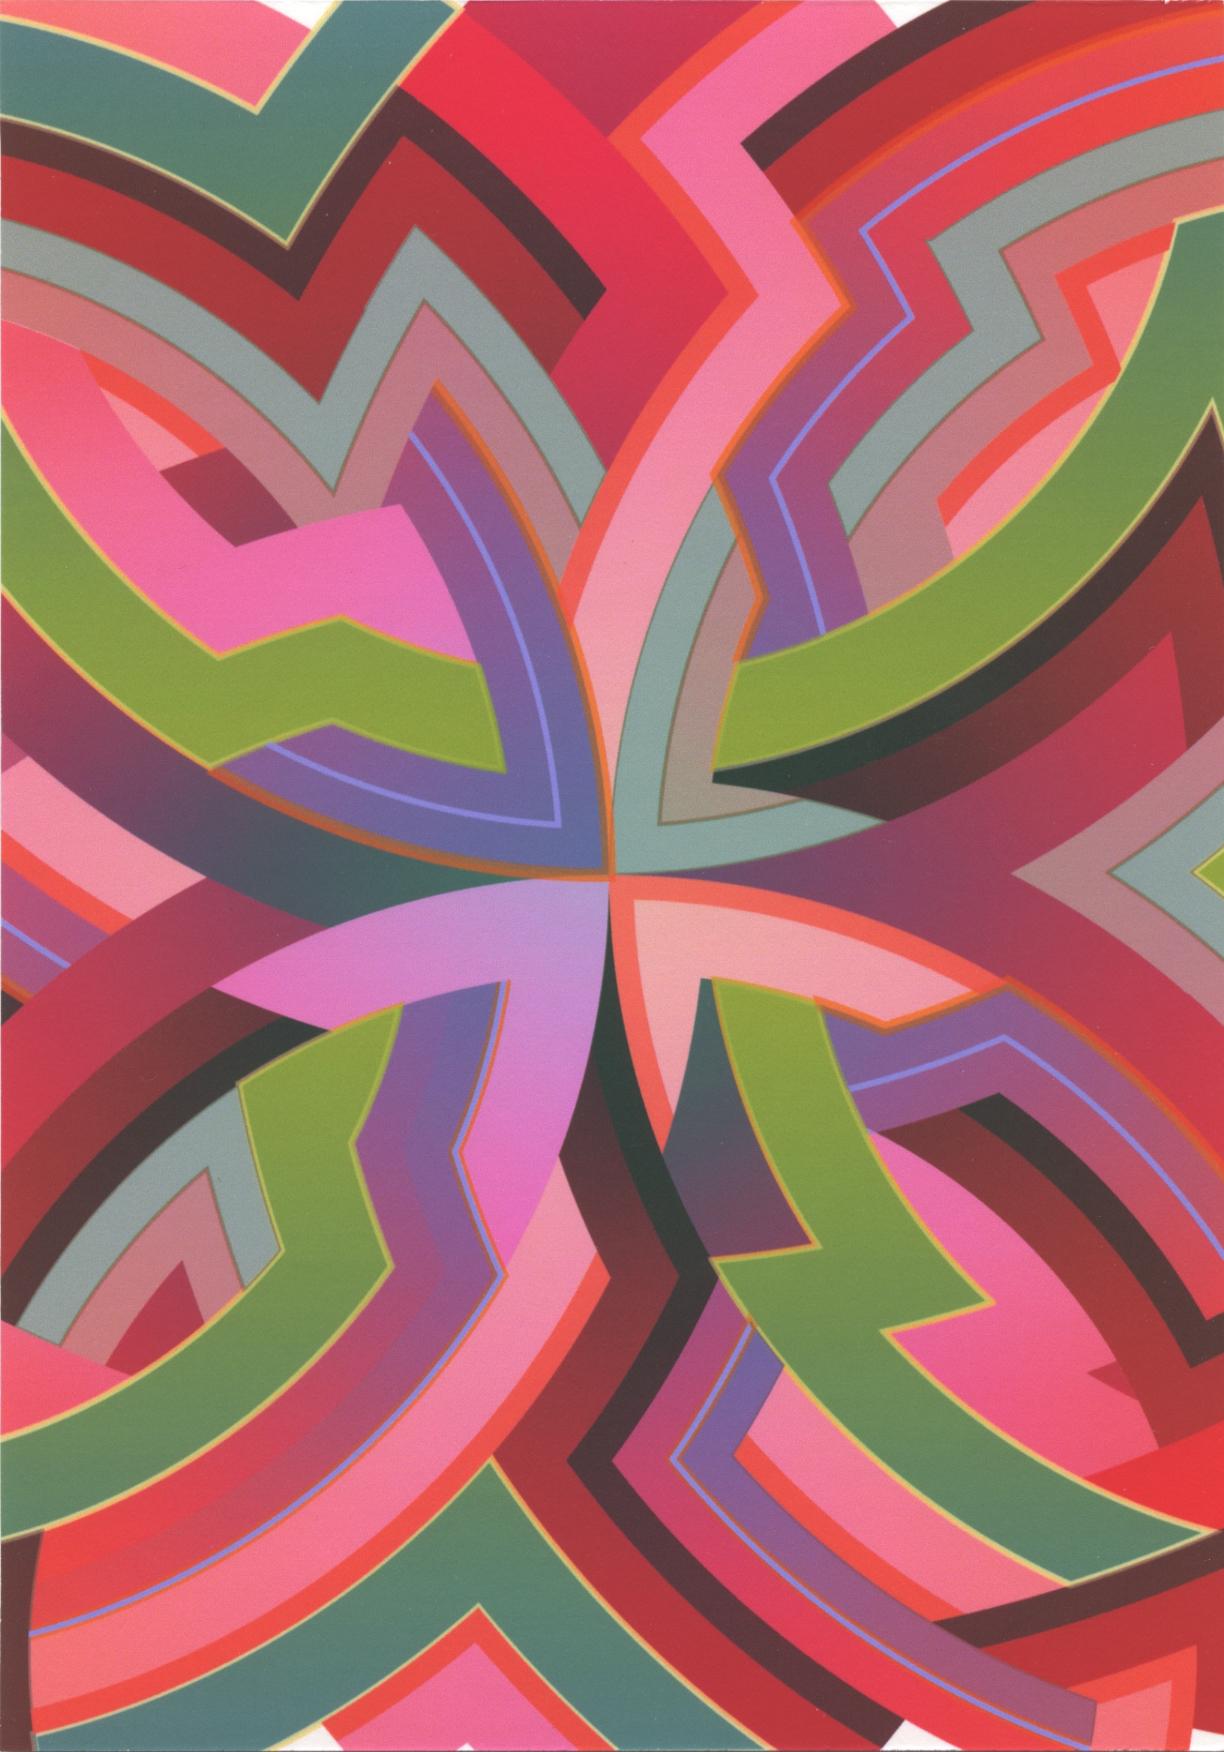 Copy of Lot 580 Interstella / WIP - Pigment Print on Card